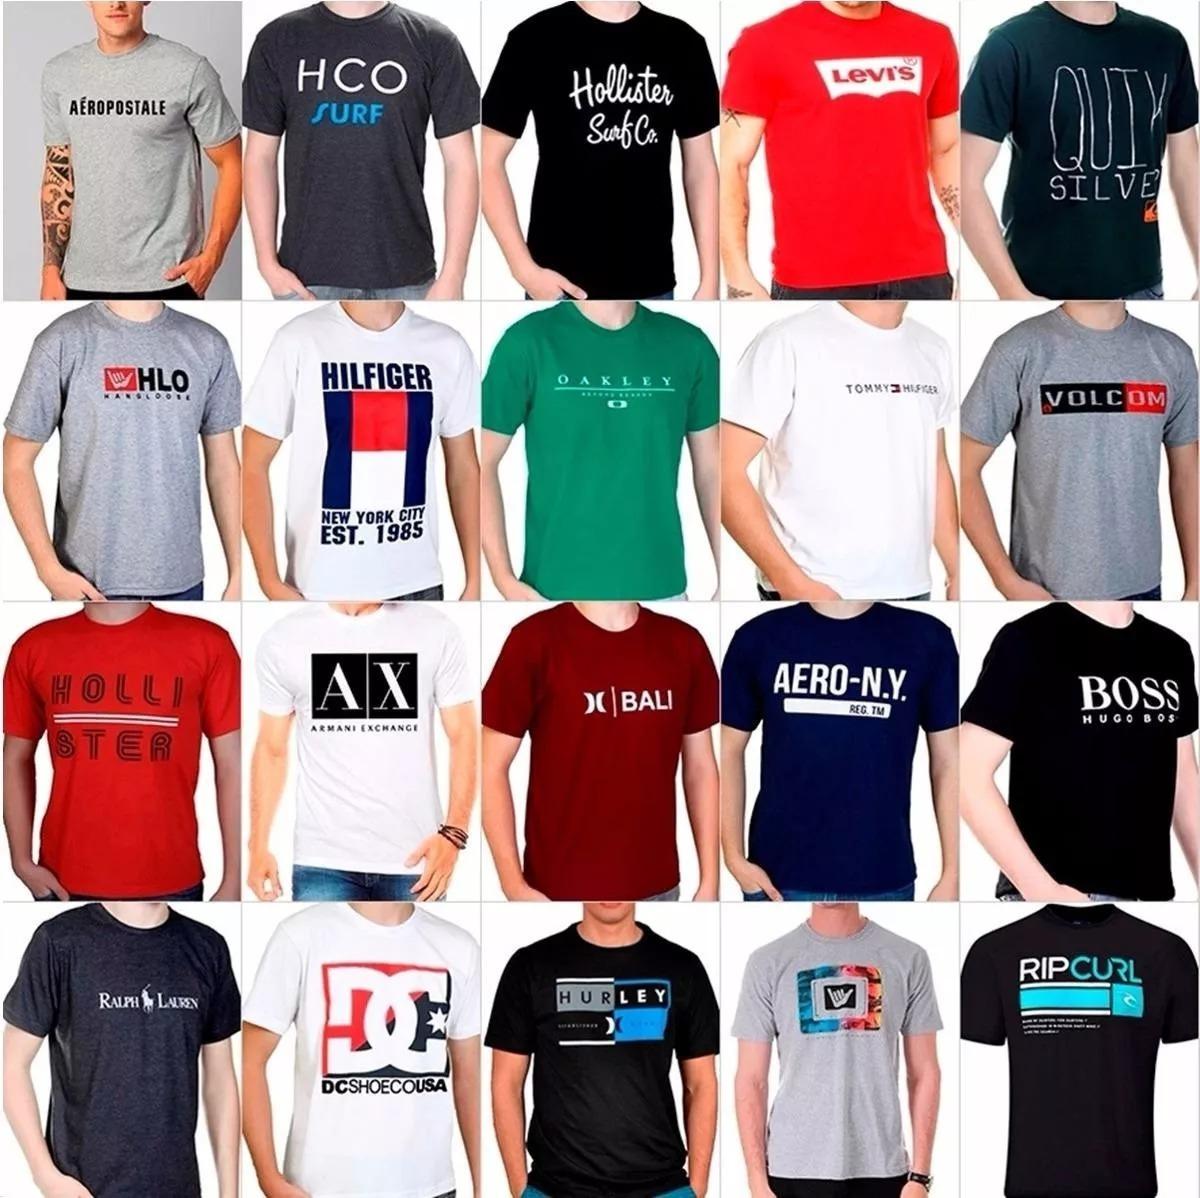 a310d4899 kit 10 camiseta camisa blusa masculina marca atacado revenda. Carregando  zoom.